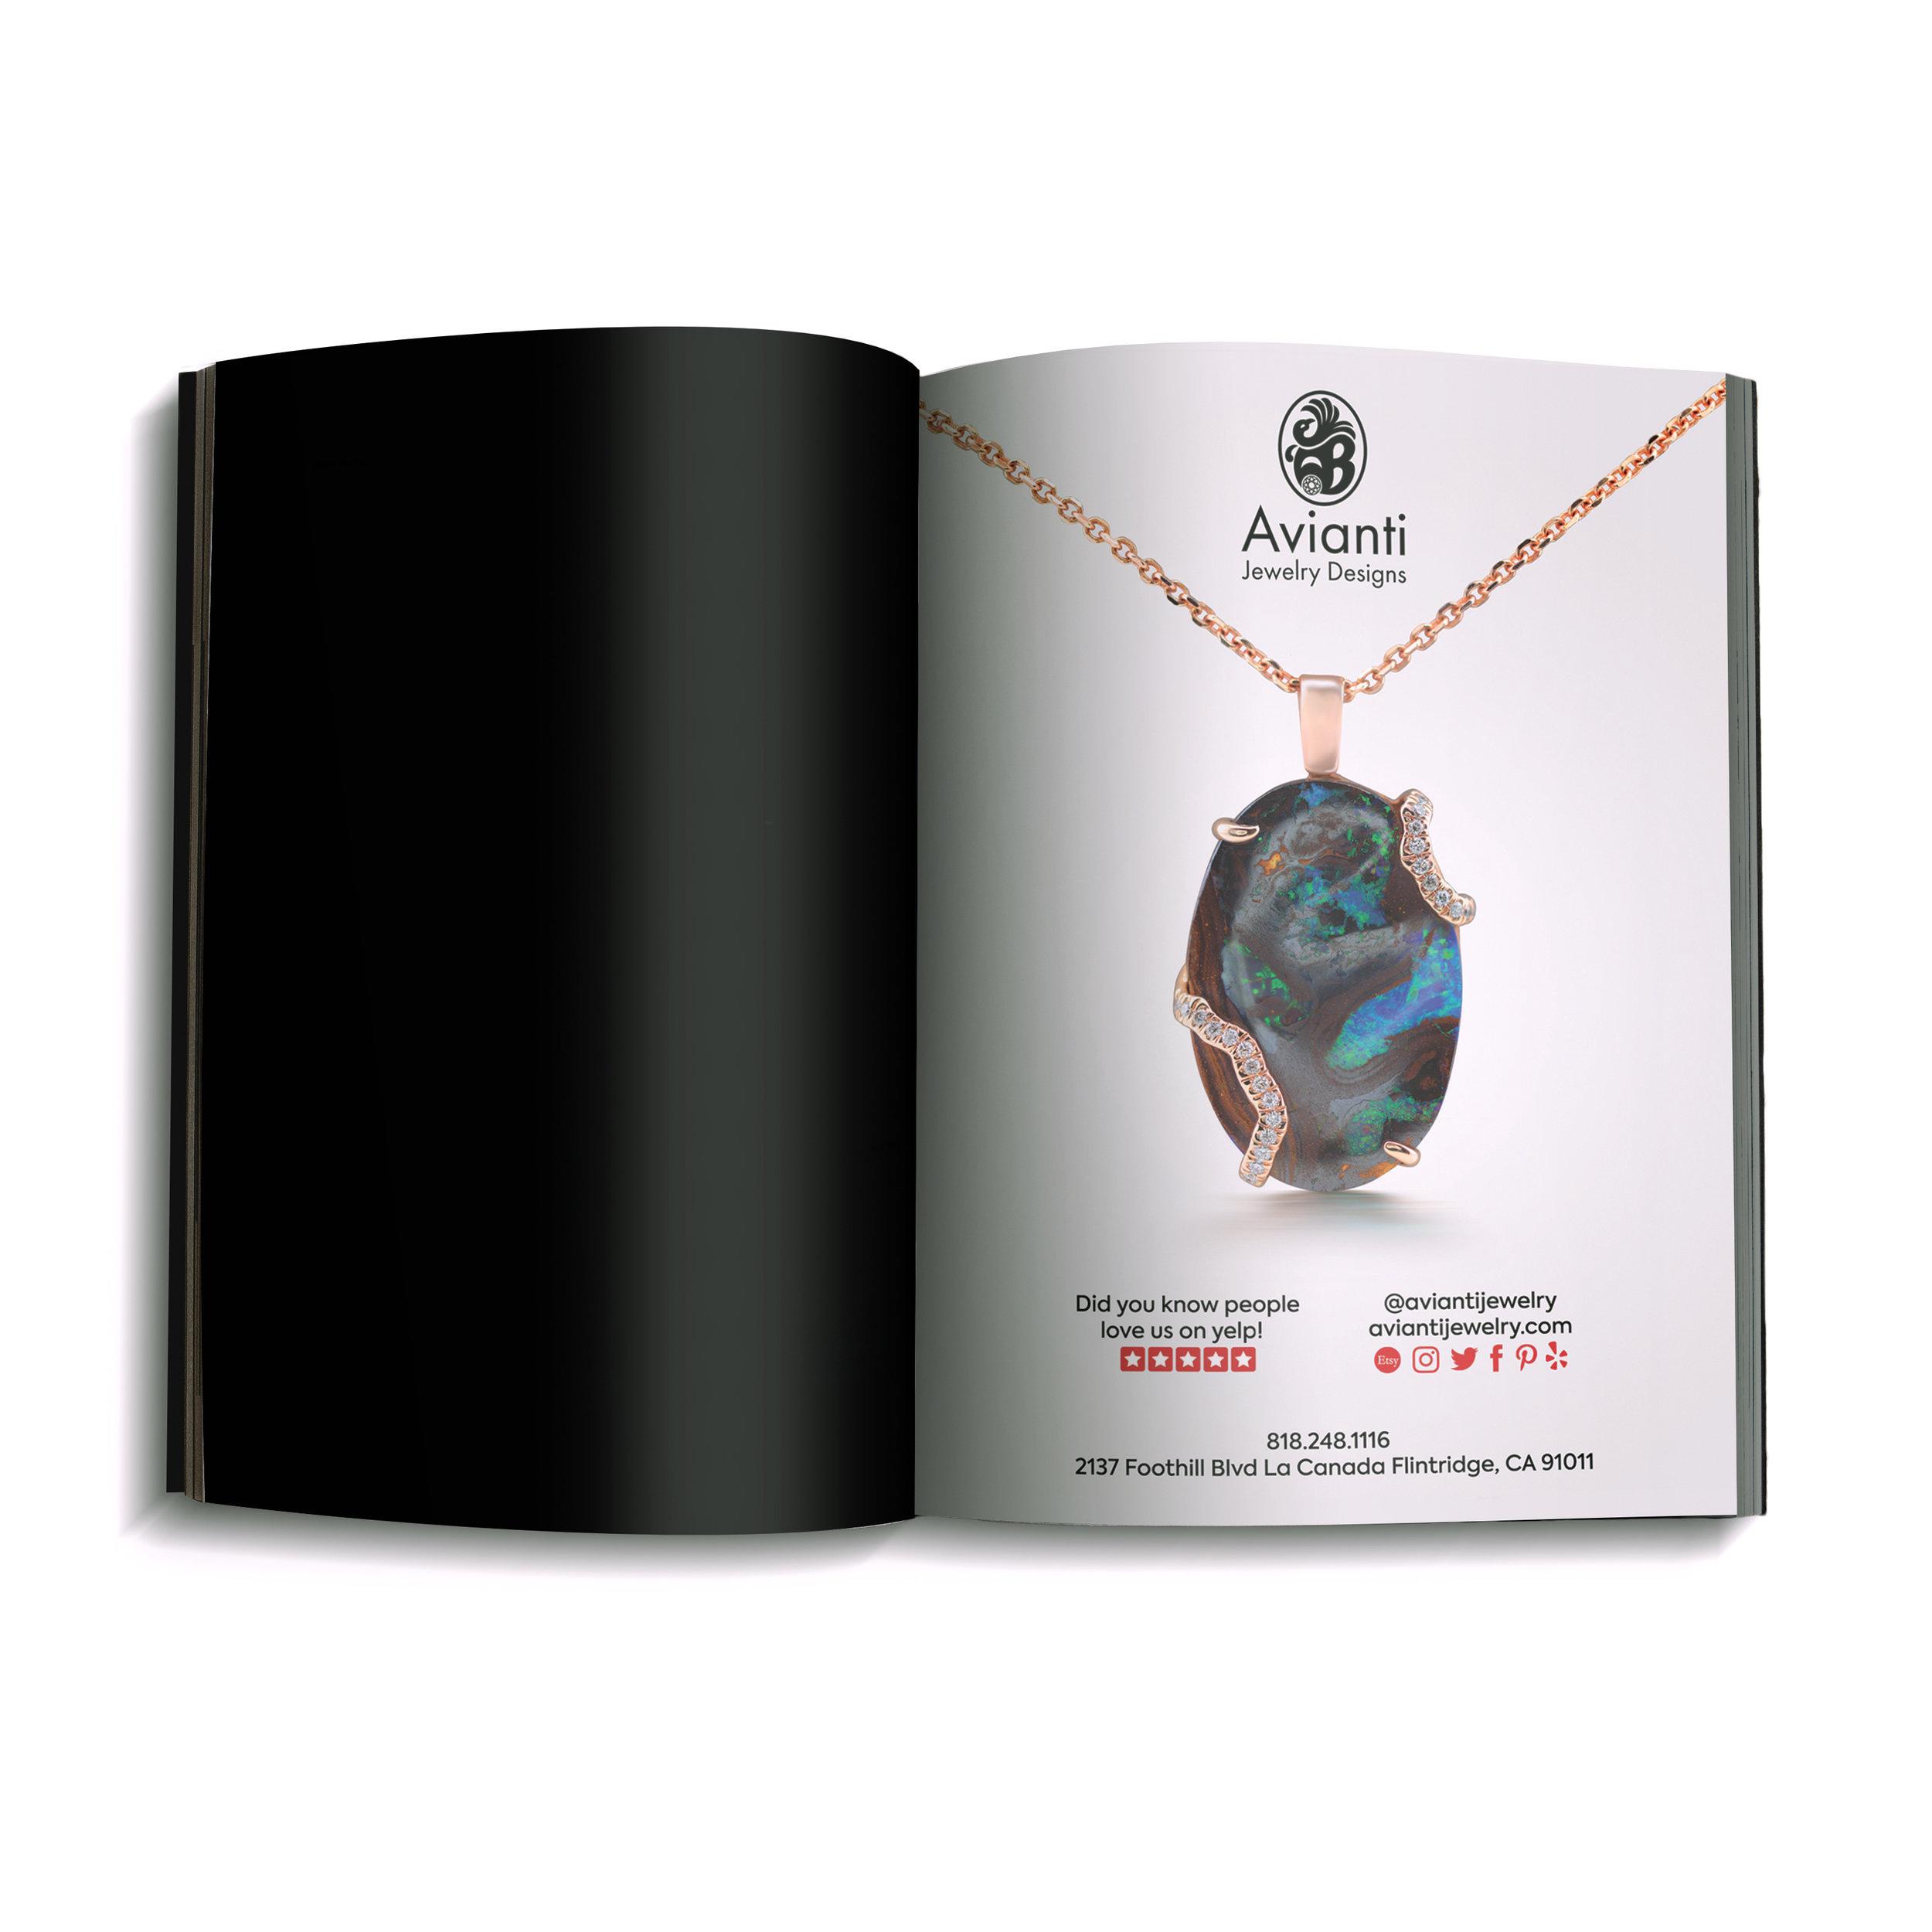 Avianti Jewelry Magazine Ad (1)